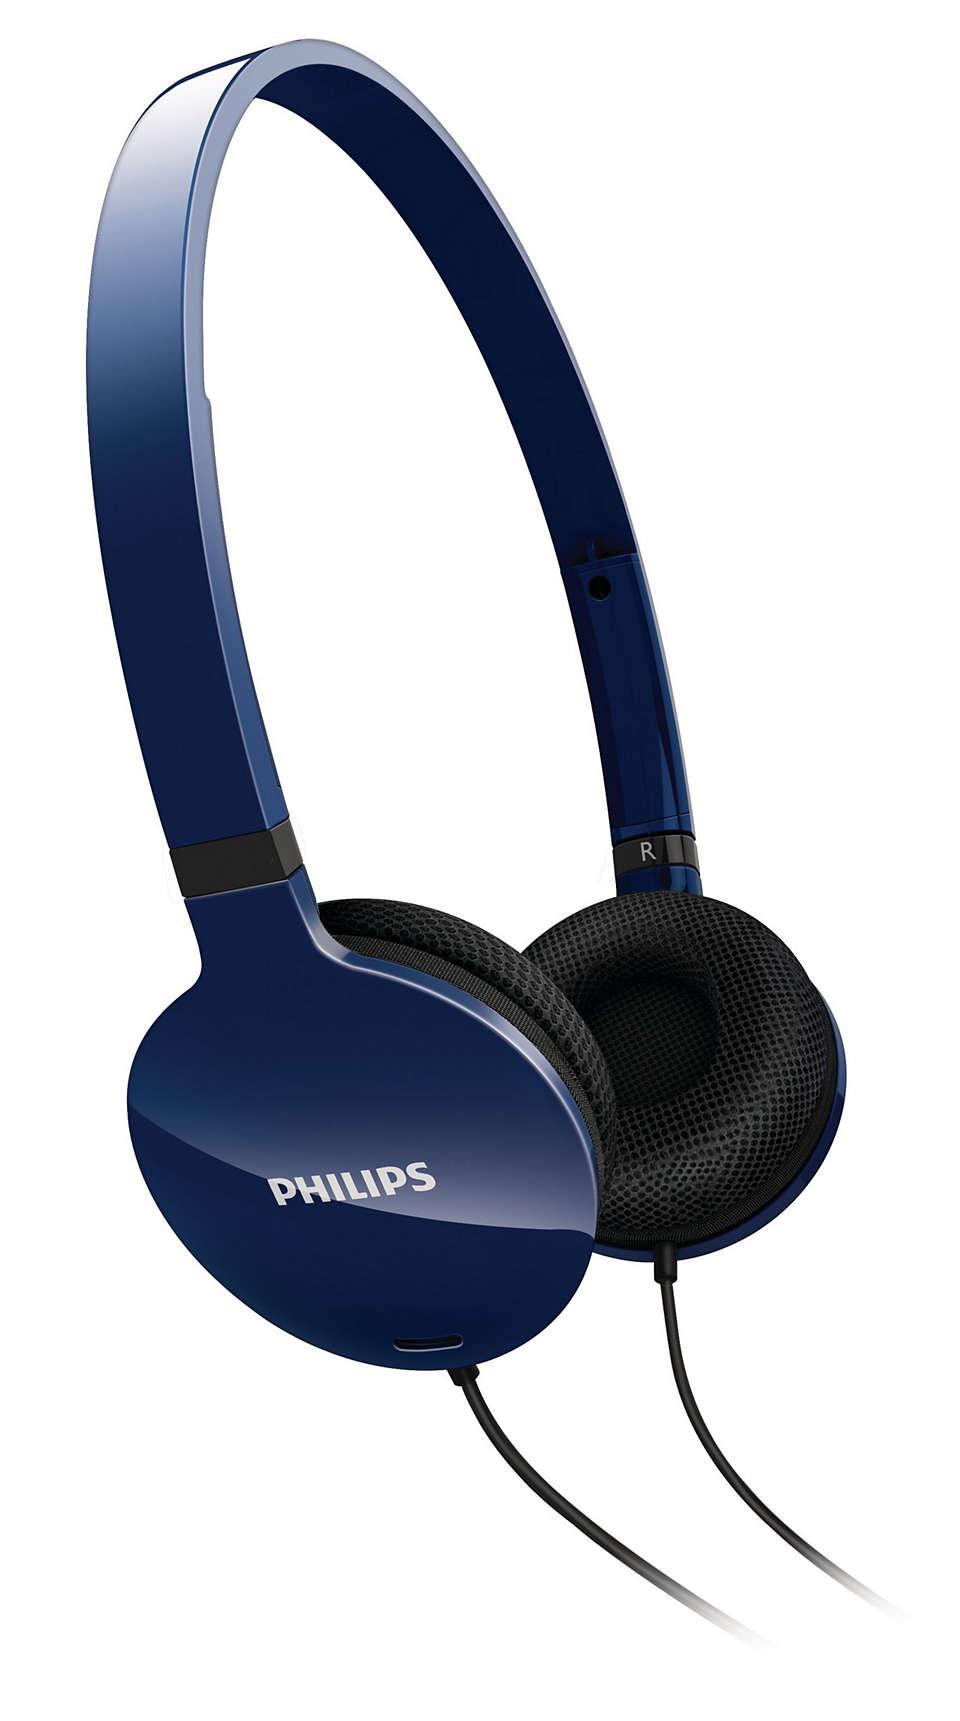 Lightweight comfort, powerful sound